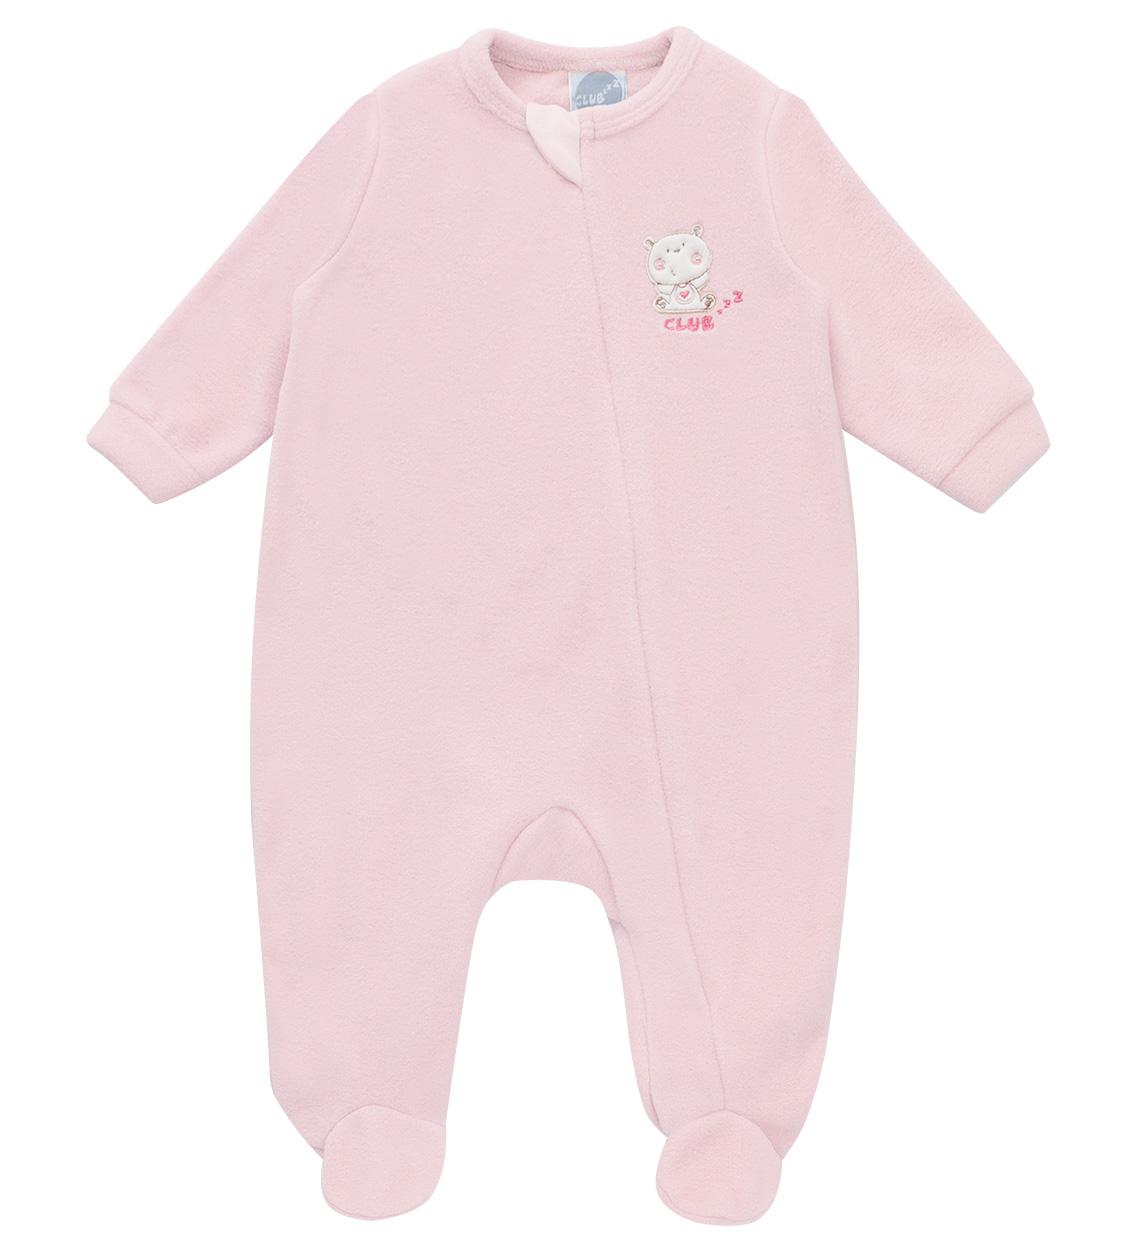 Macacão Pijama Rosa Bebê (zíper)